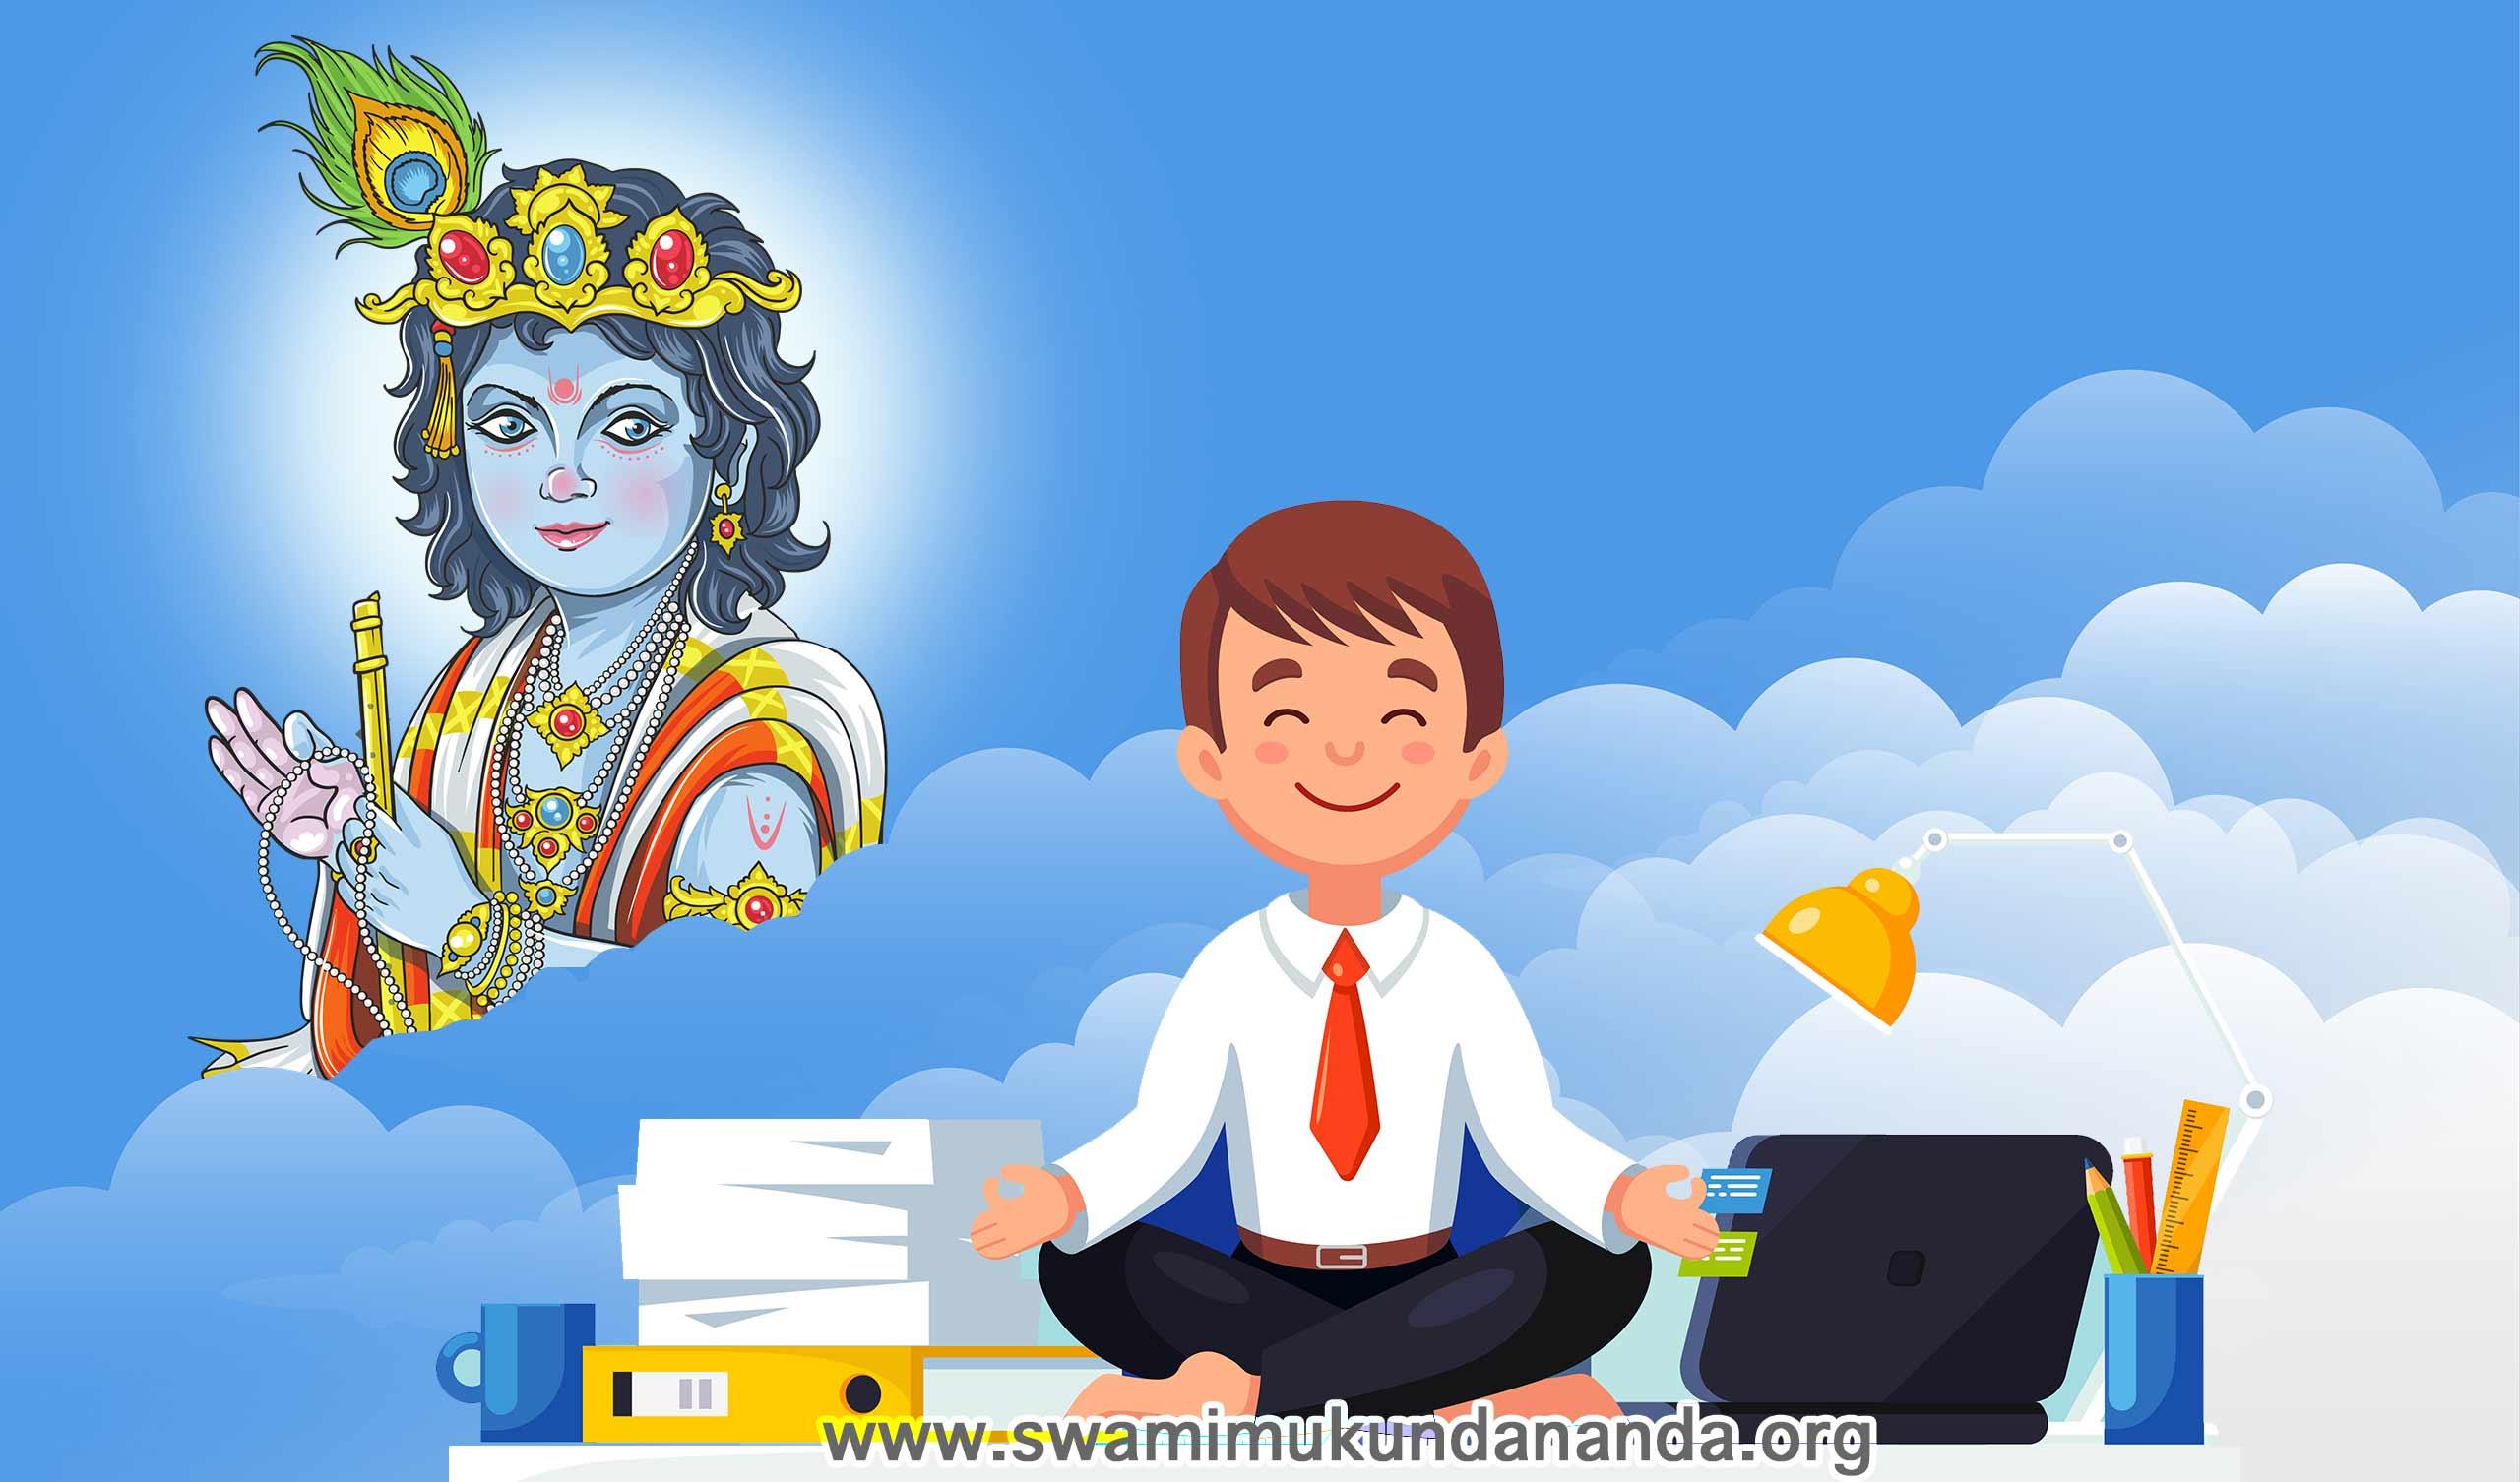 swami-mukundananda-blog-self-help-practice-karm-yog